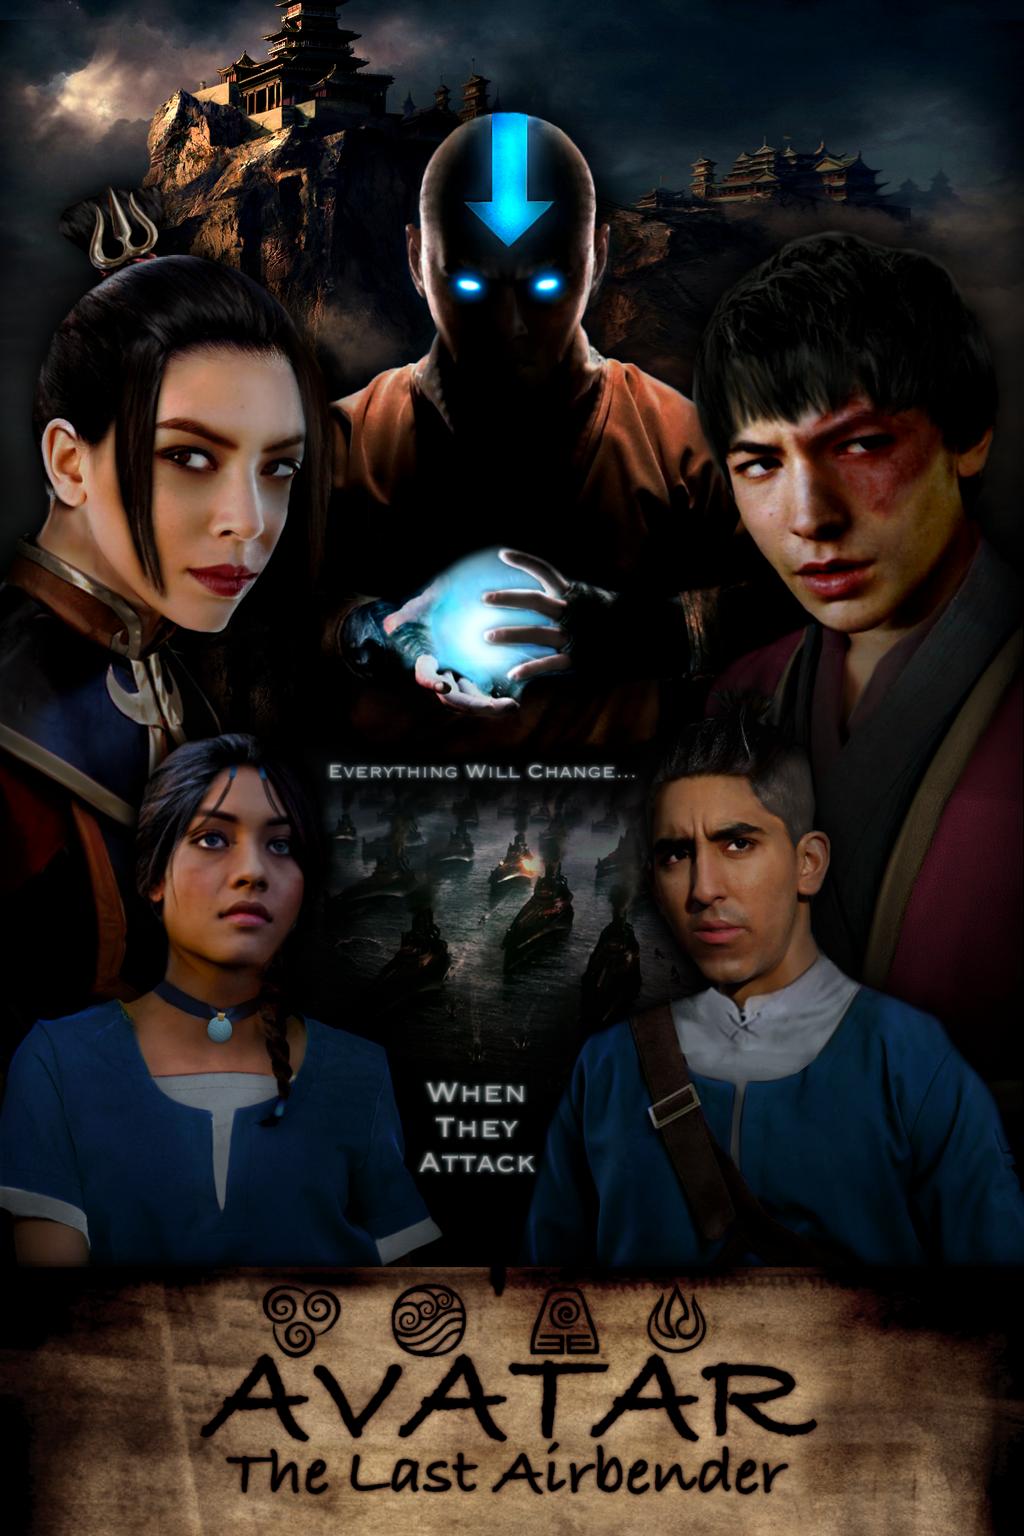 Movie art on Avatar-ATLA-Fans - DeviantArt  Avatar The Last Airbender 2 Movie